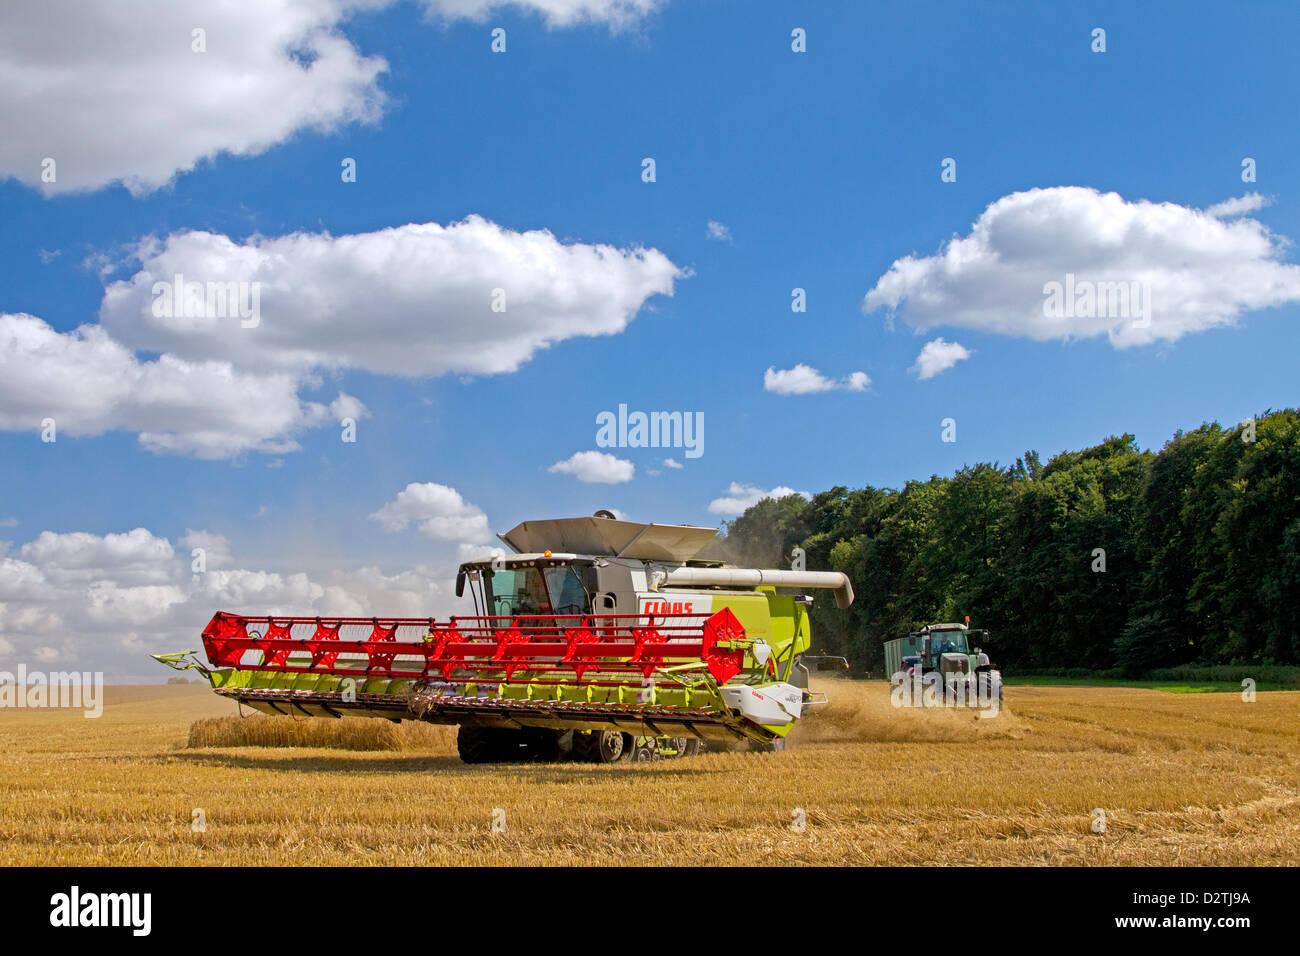 Farmer in combine harvester harvesting cereals on cornfield / wheat field of farmland in summer - Stock Image